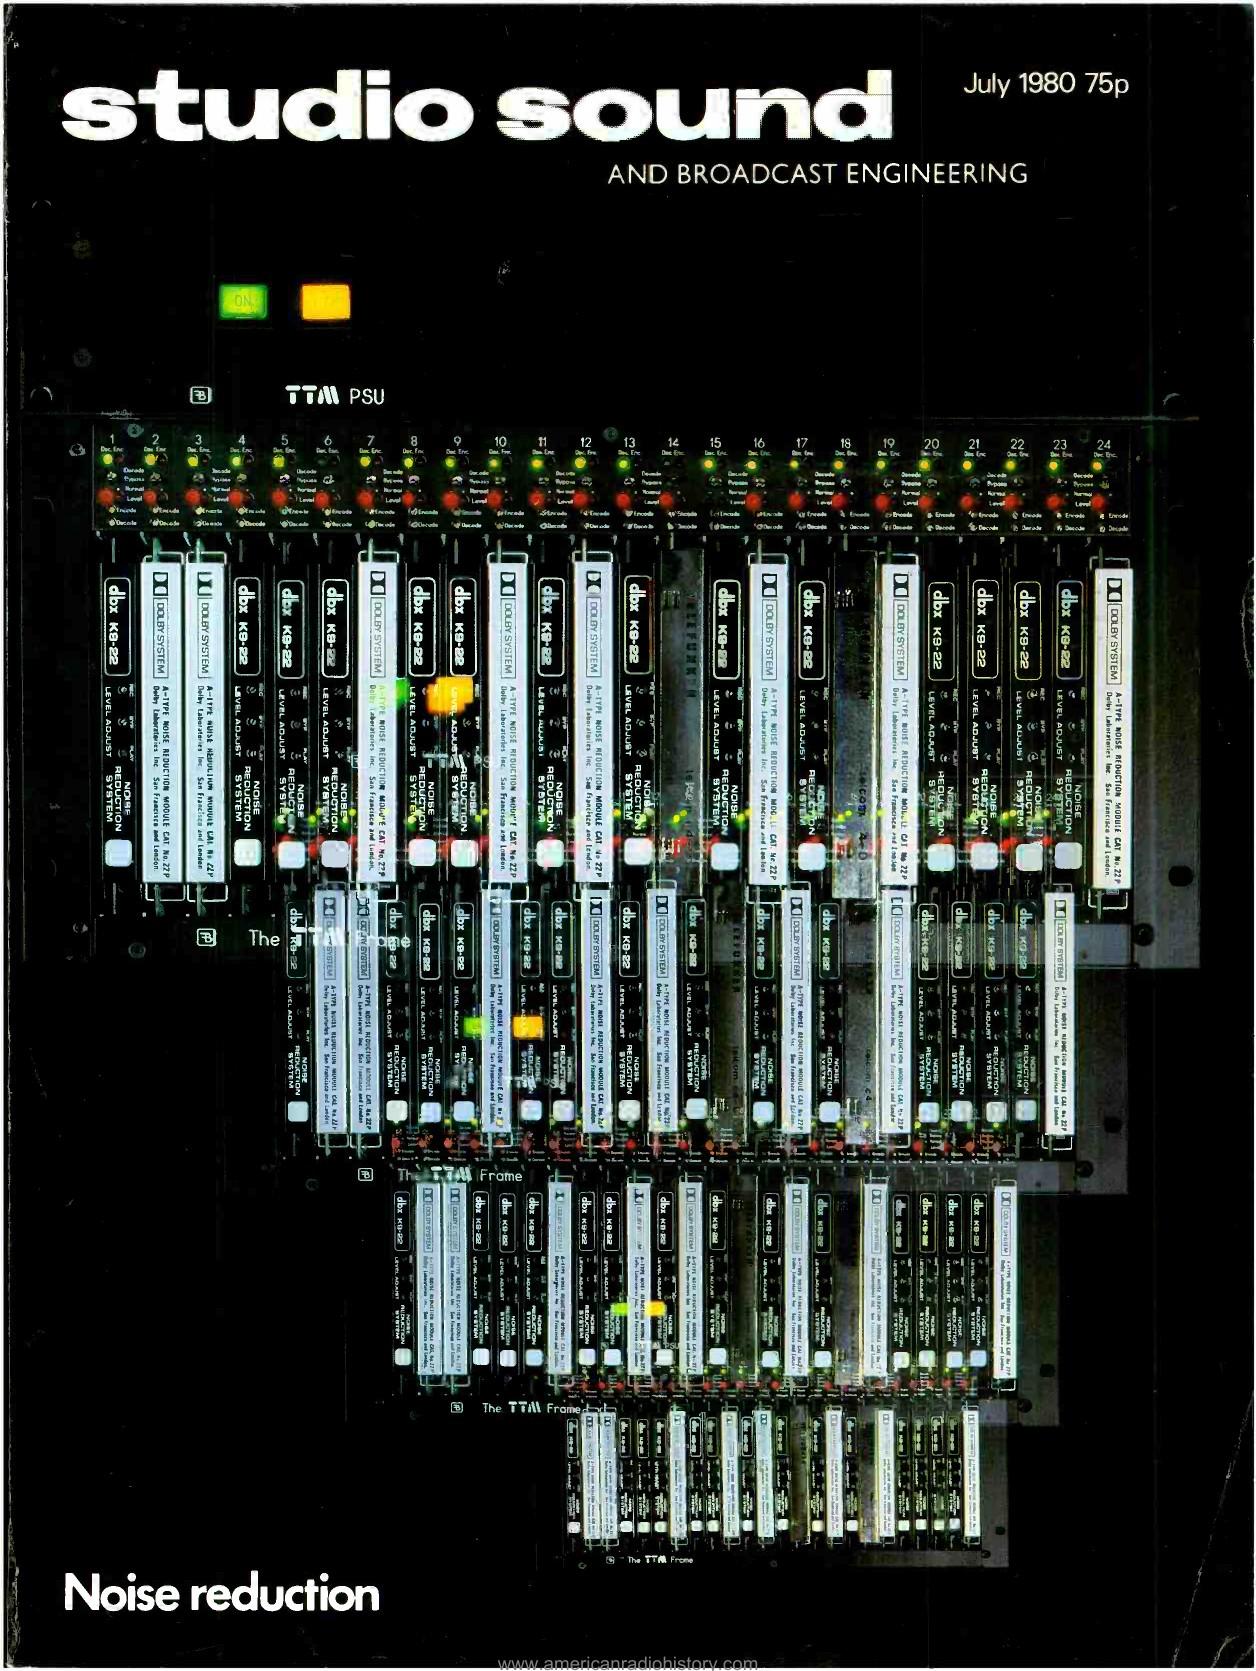 Noise reduction American Radio History